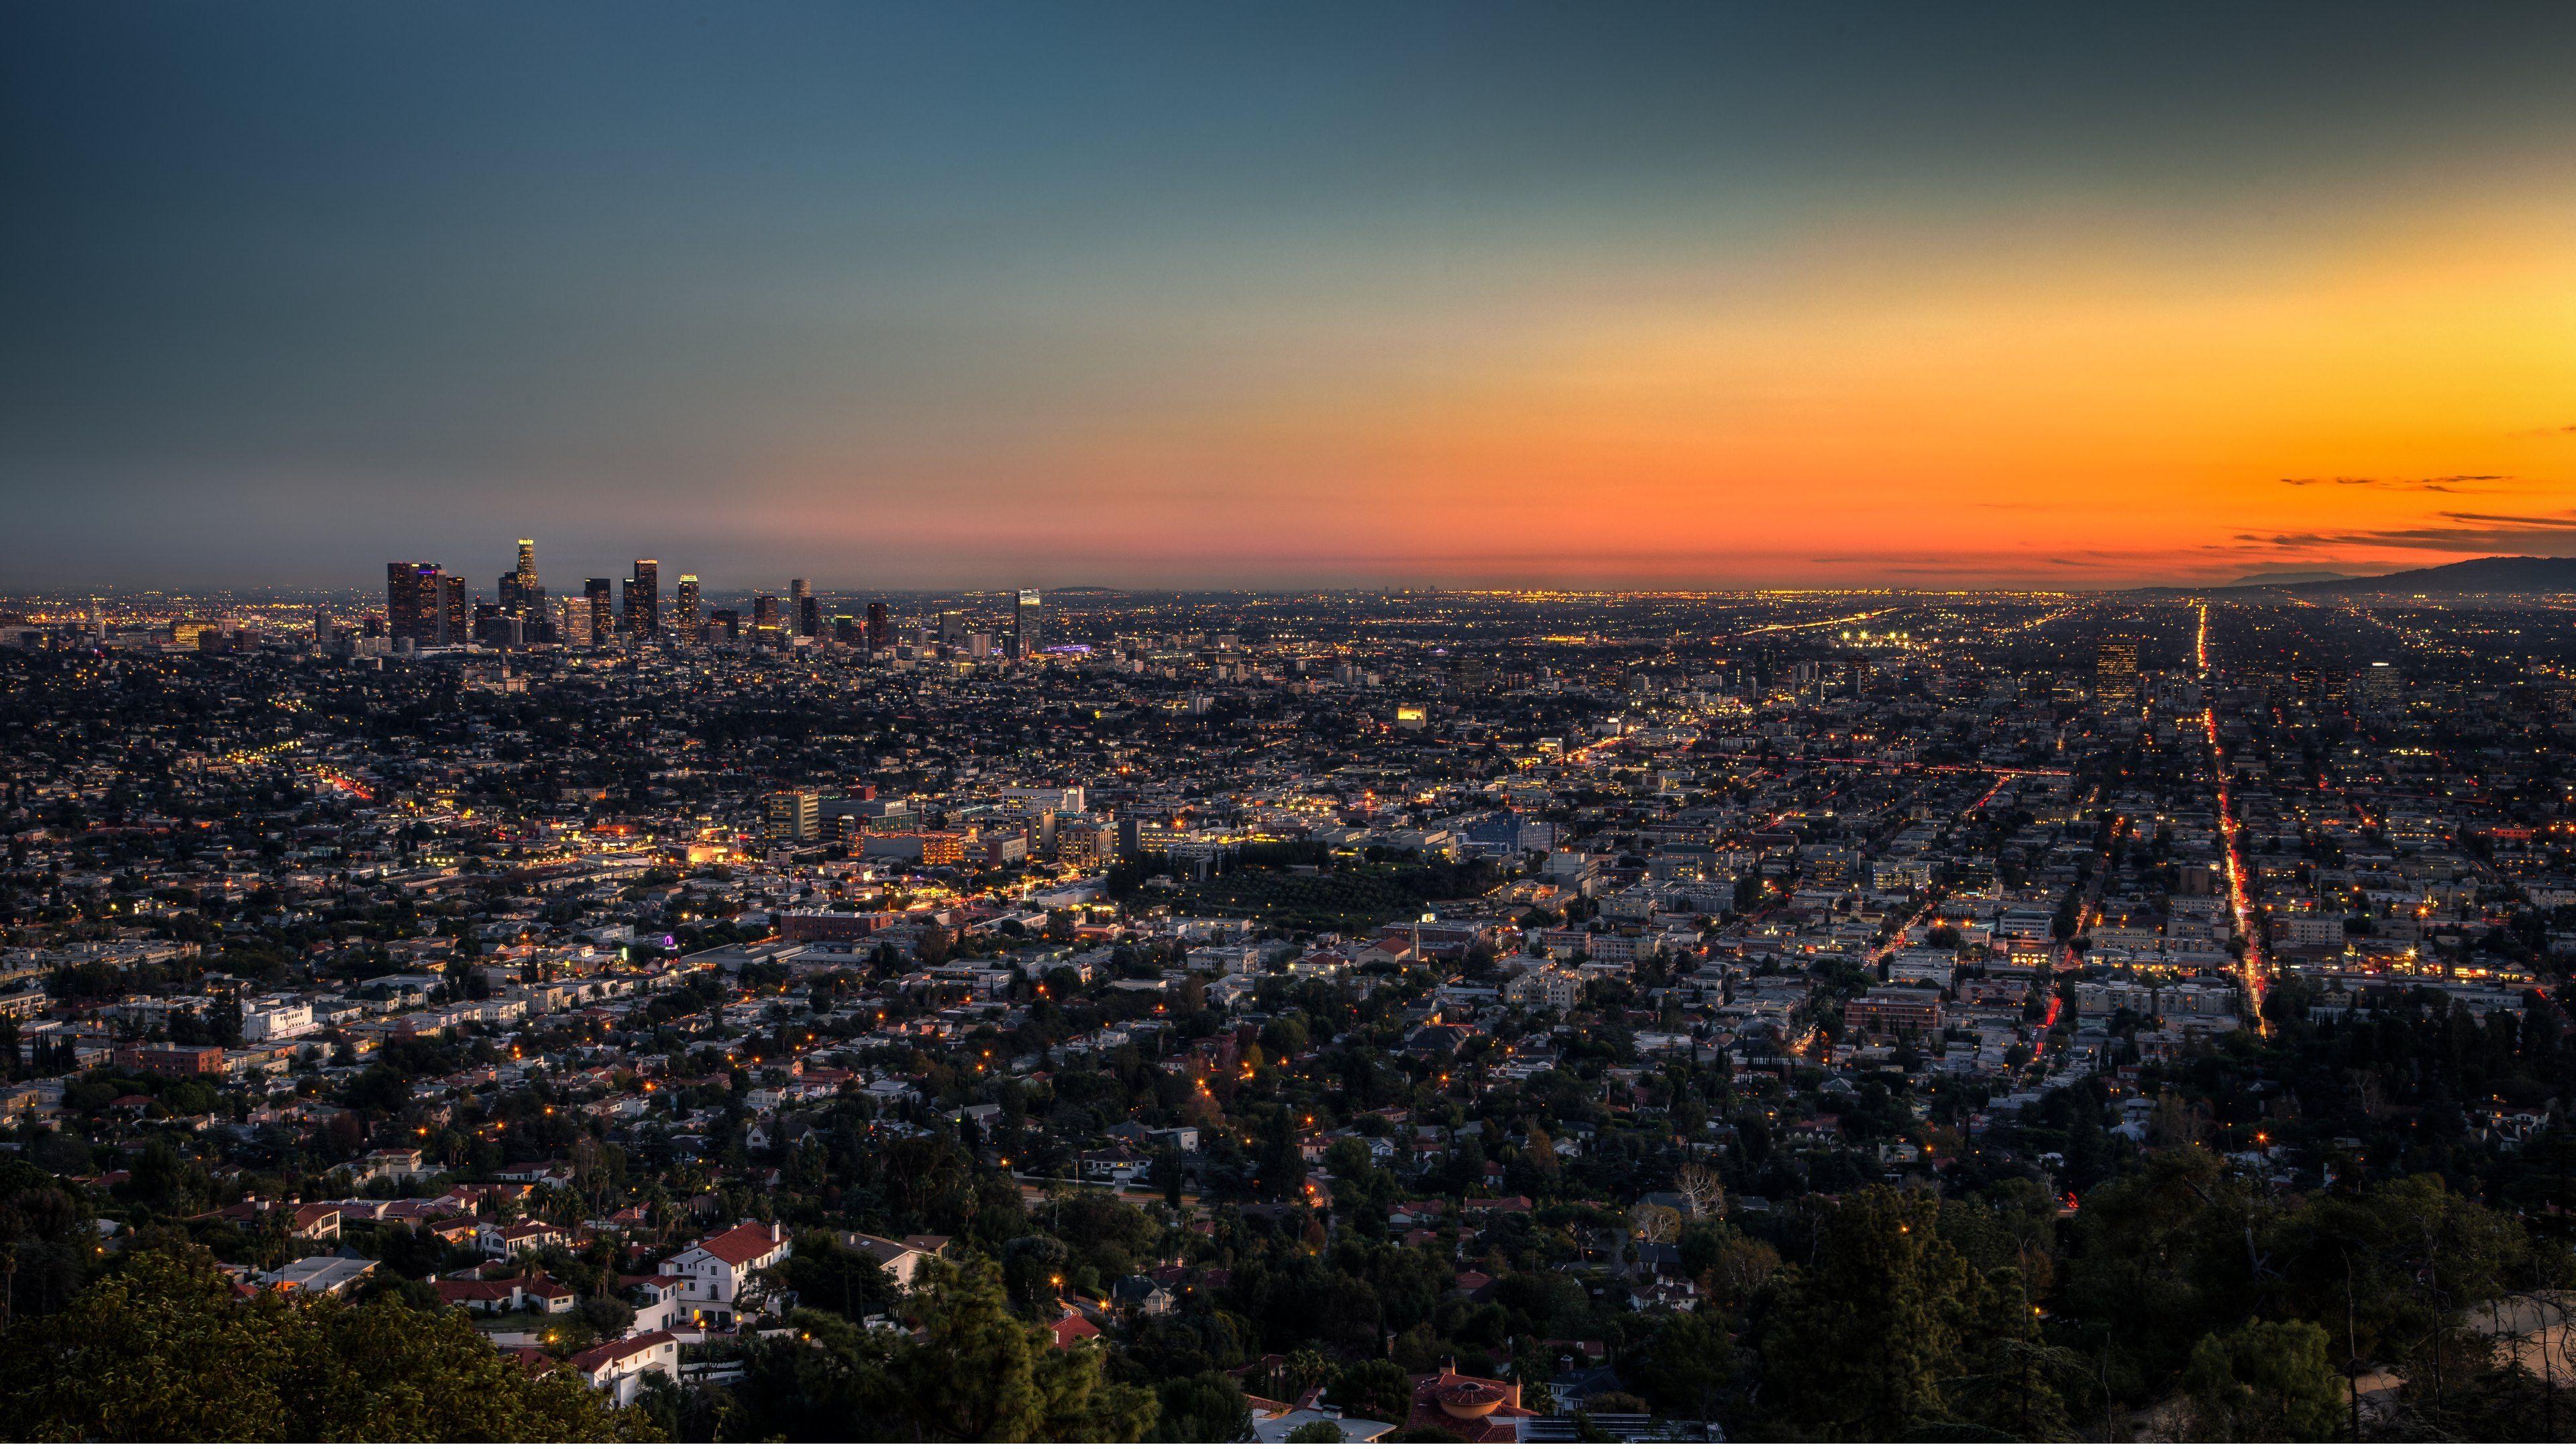 Los Angeles Wallpaper 4k , HD Wallpaper & Backgrounds